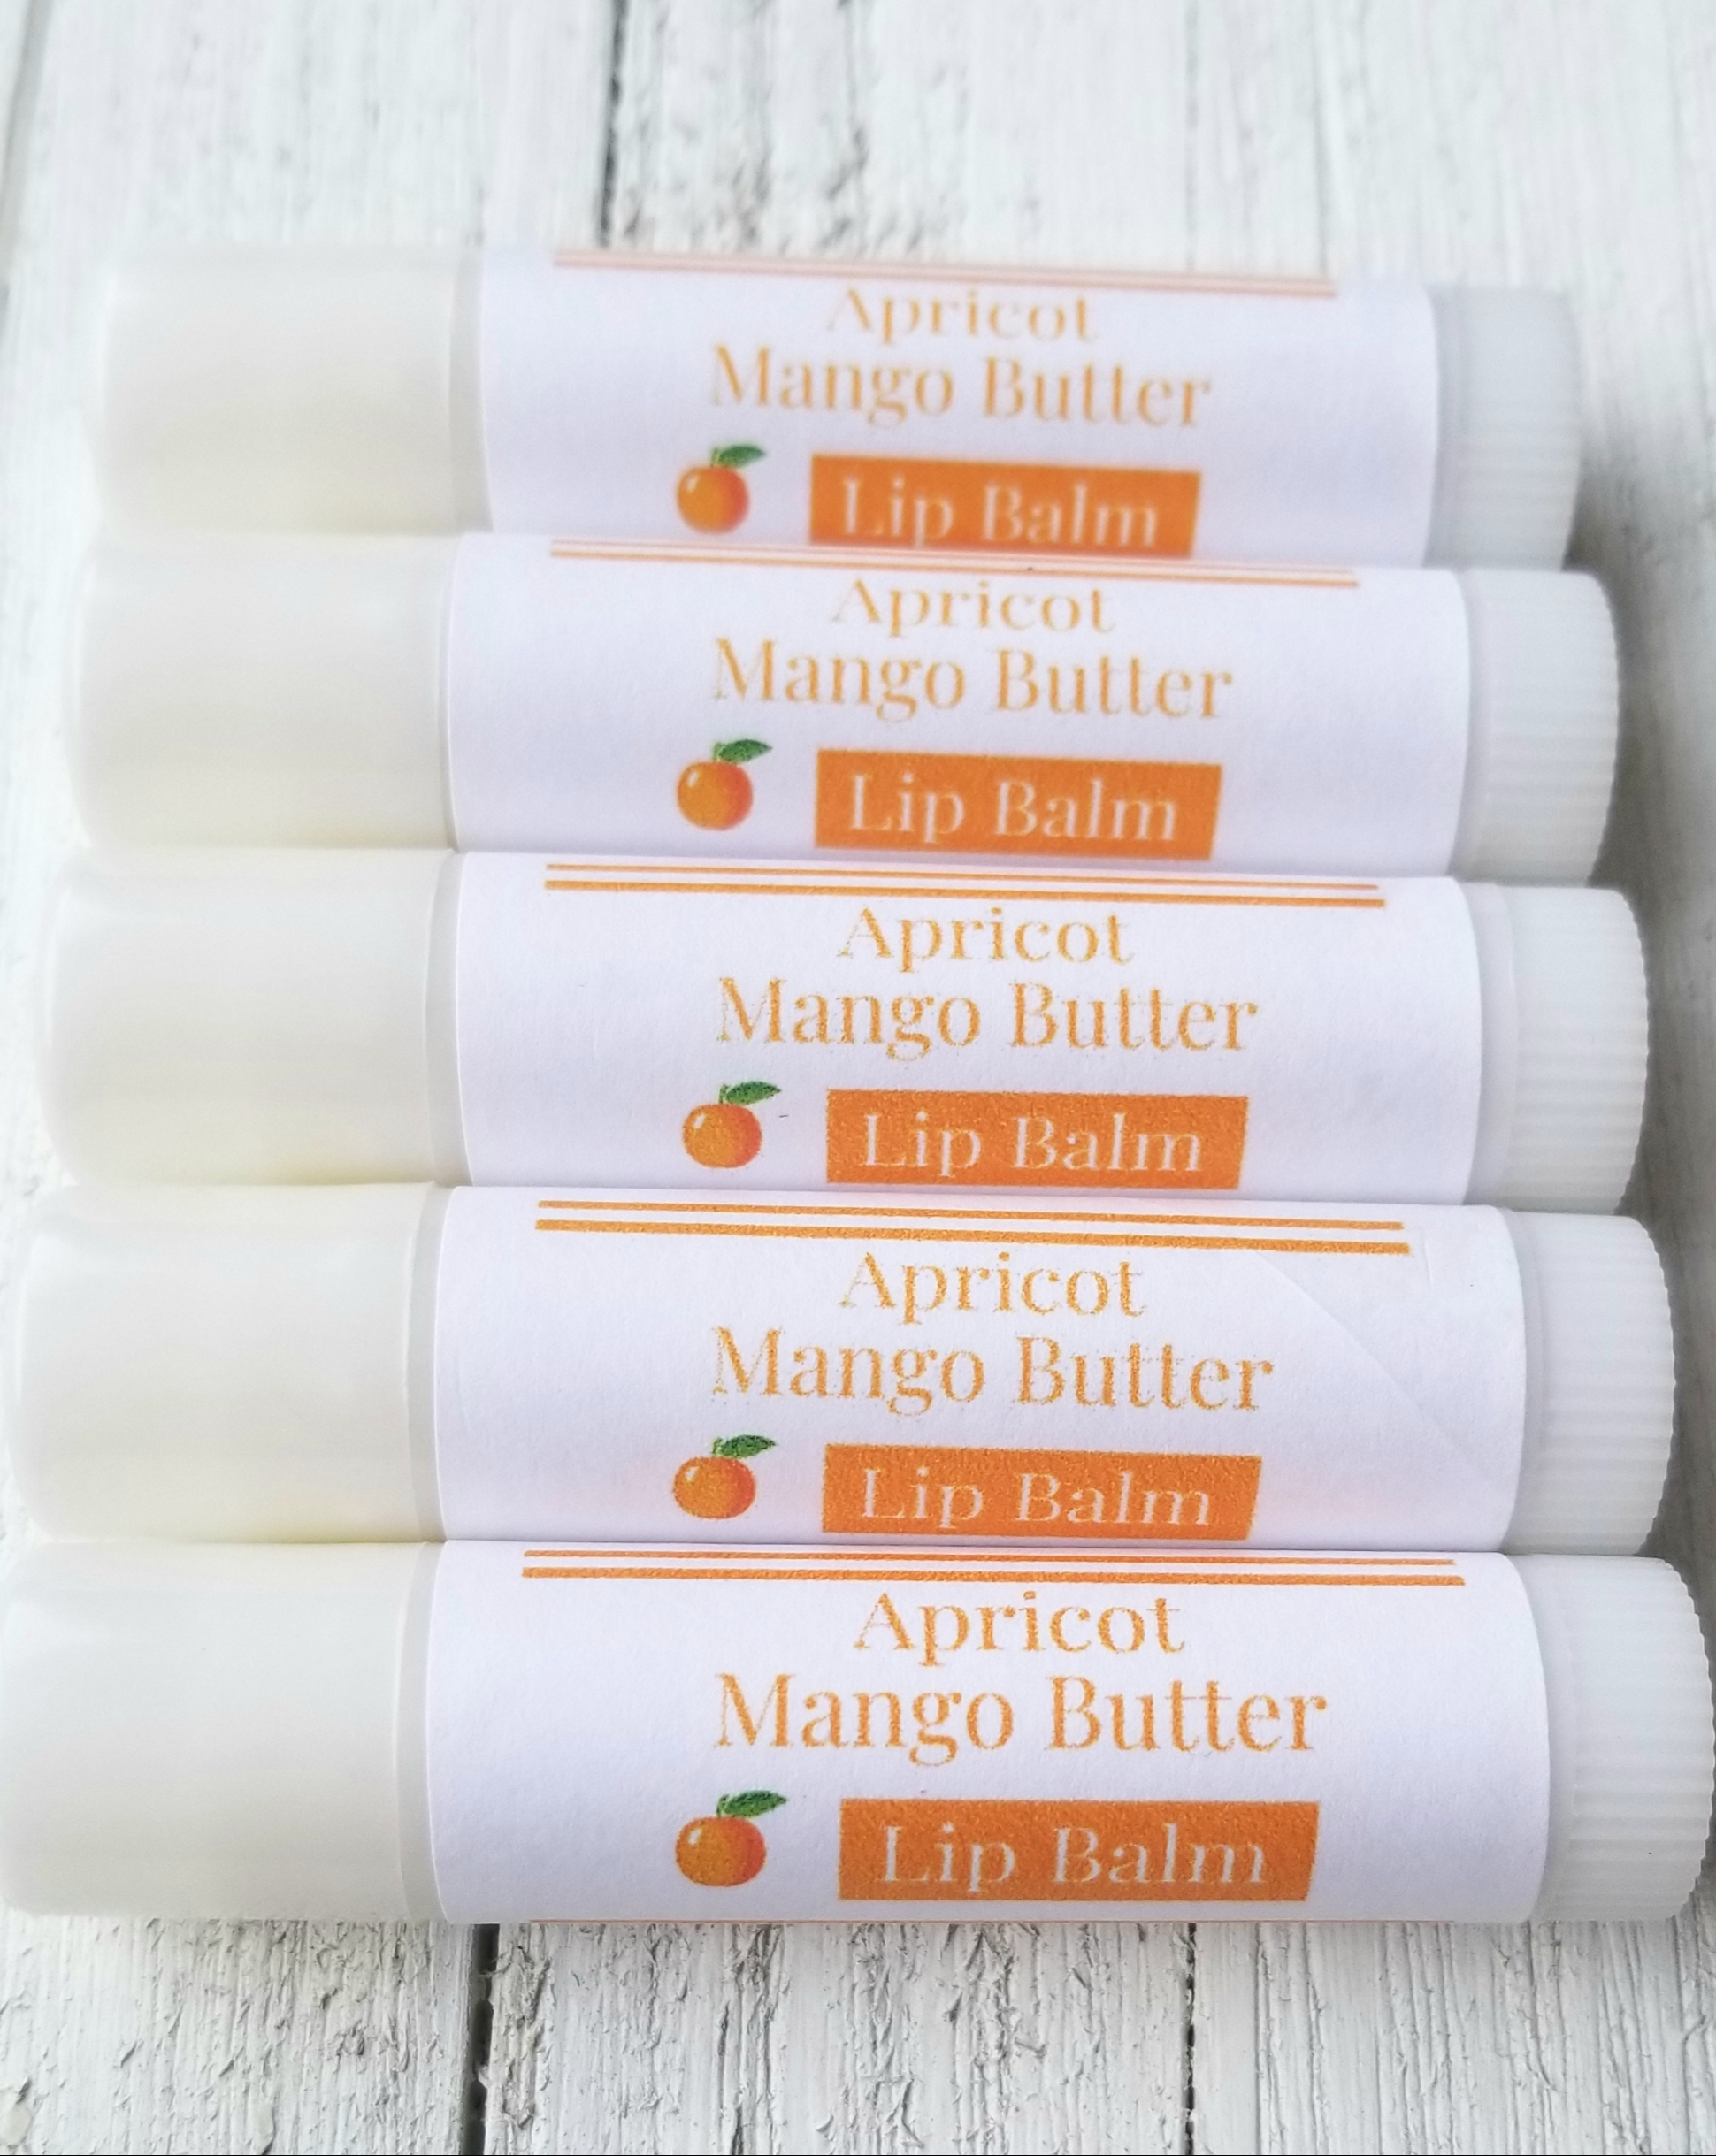 apricot-mango-butter-lip-balm-5-tubes.jpg